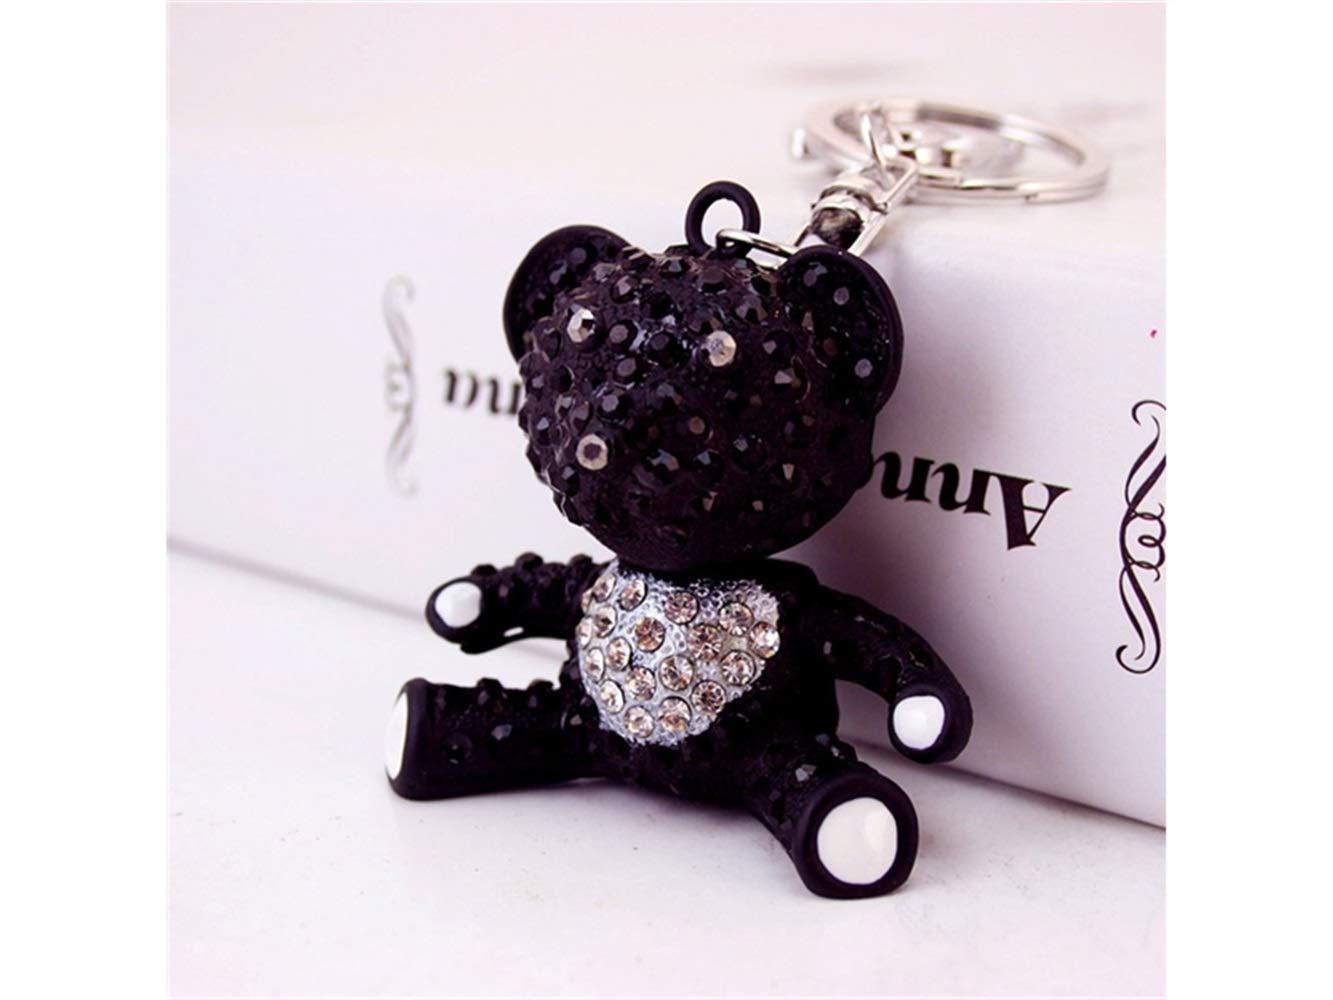 Car Keychain, Creative Exquisite Bear Keychain Animal Key Trinket Car Bag Key Holder Decorations(Black) for Gift